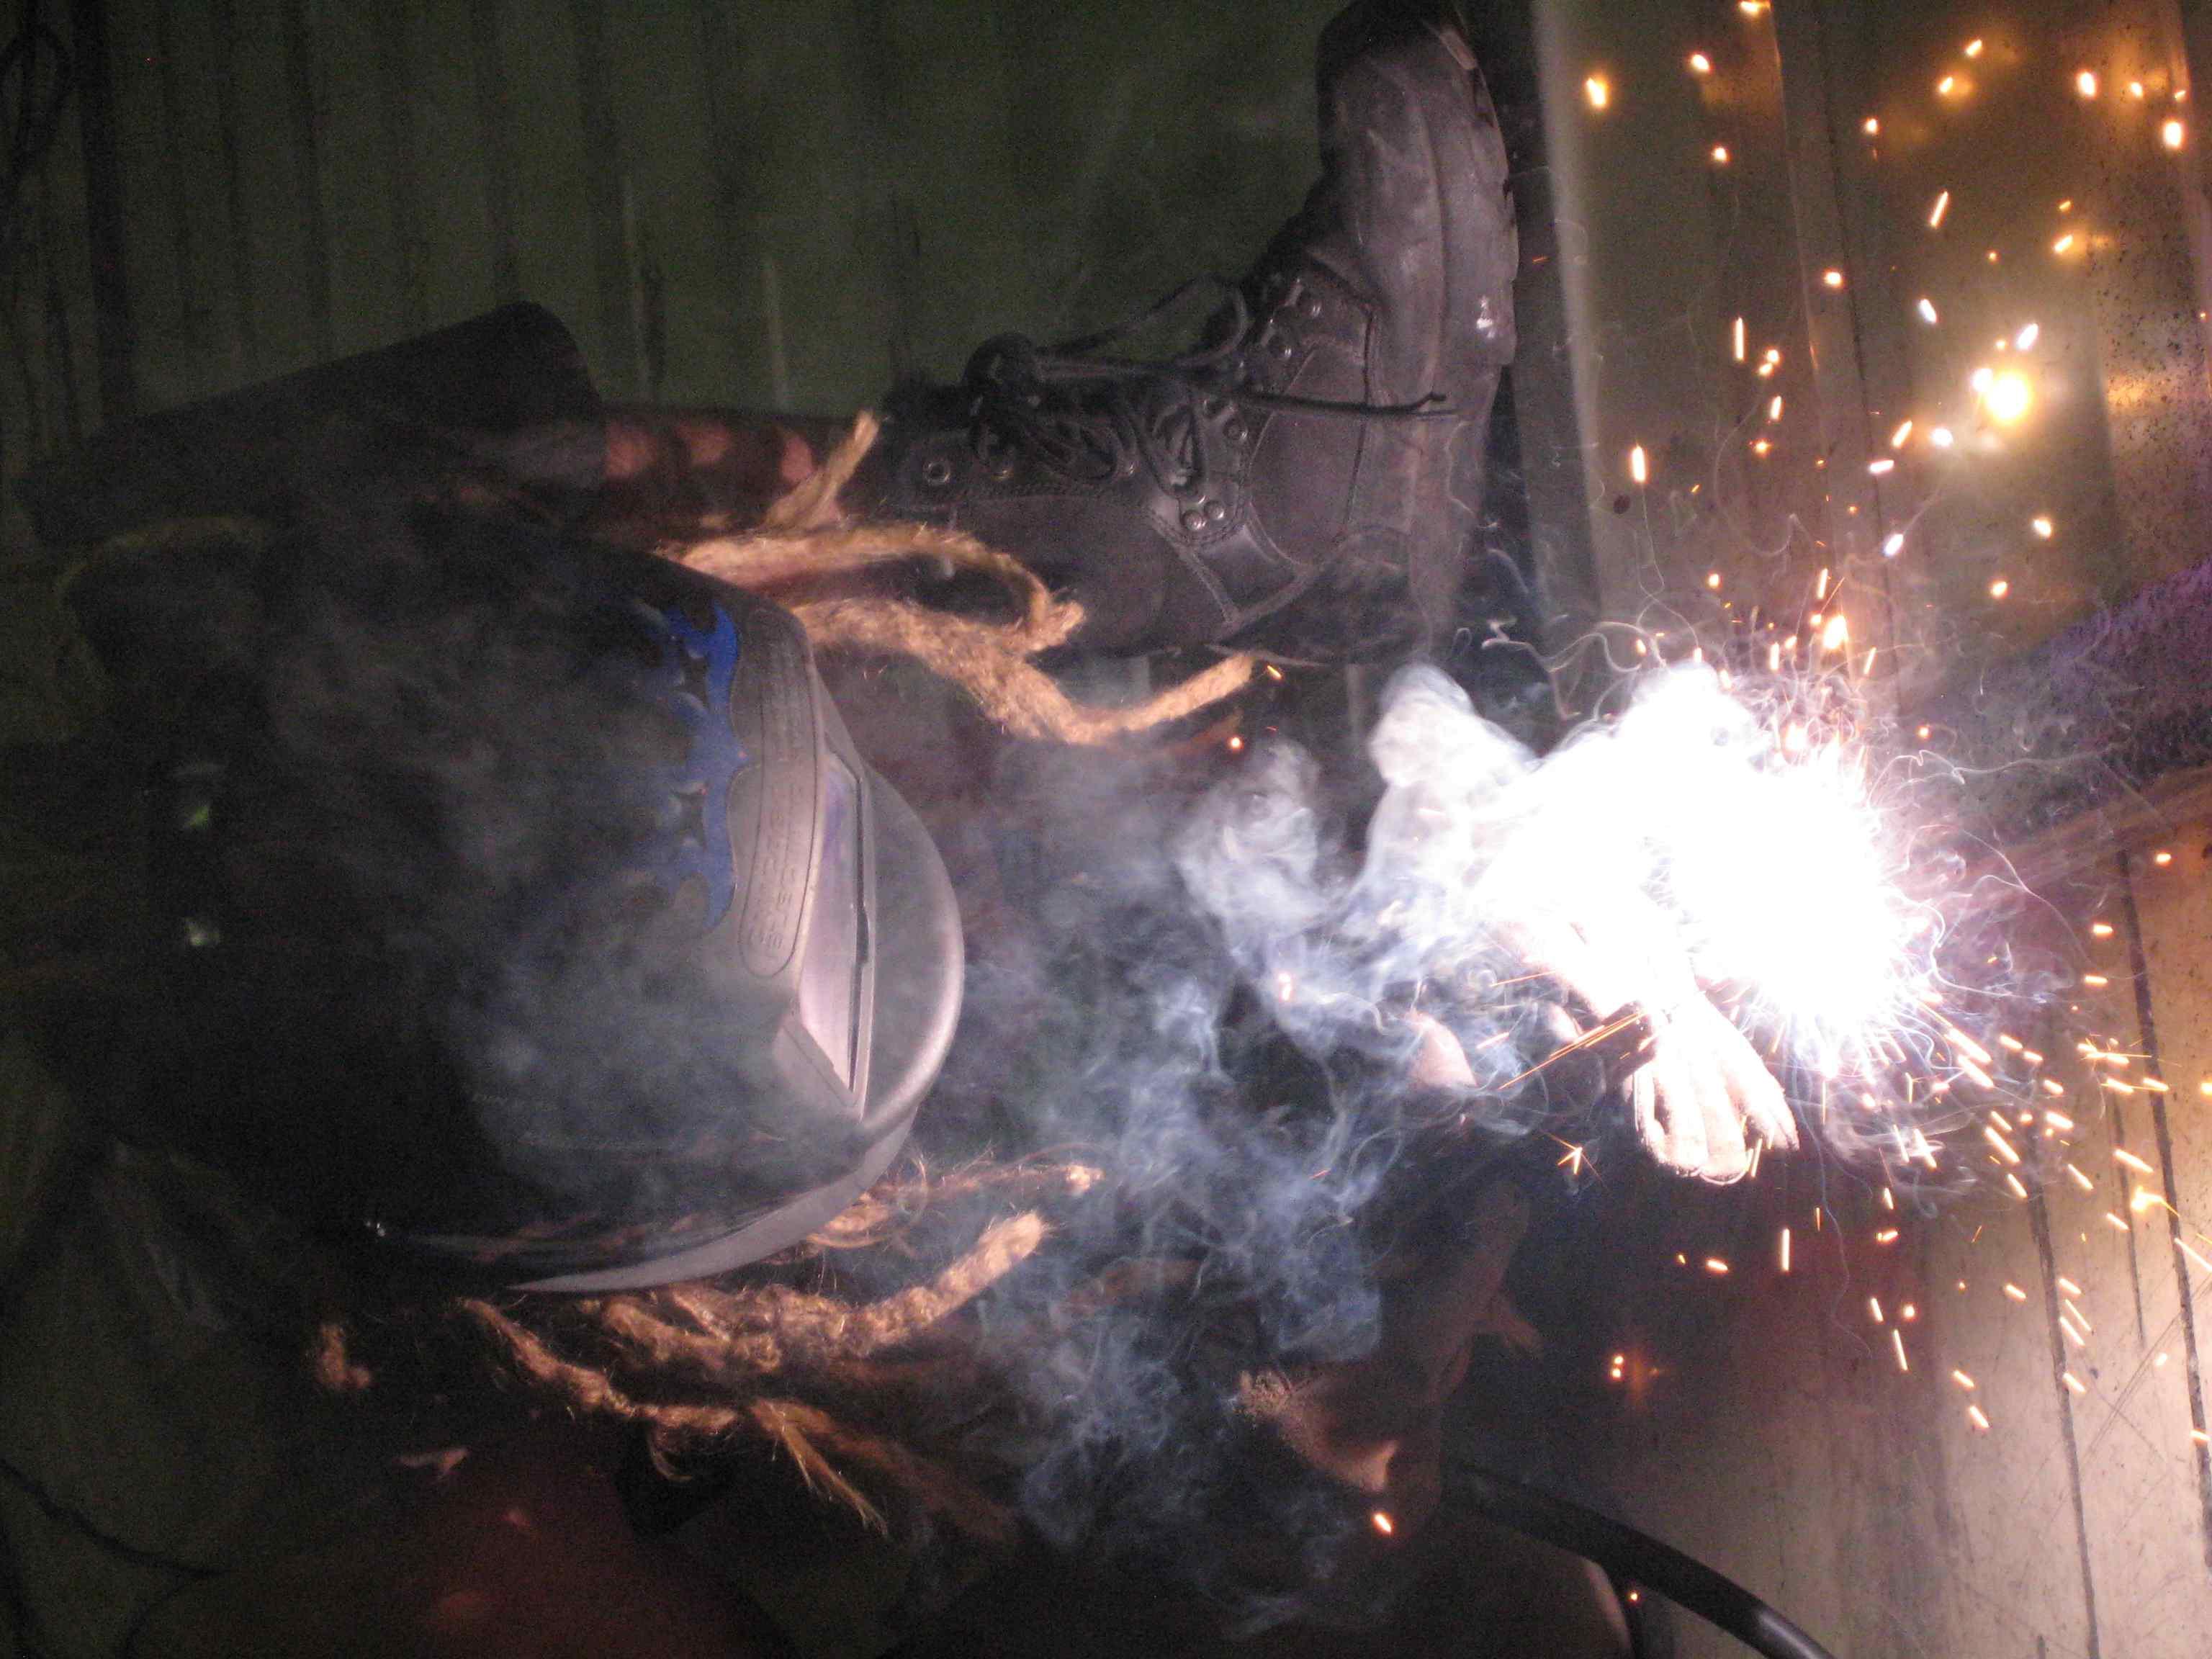 Kokopaullie (of Sew Ops) welding the new floors